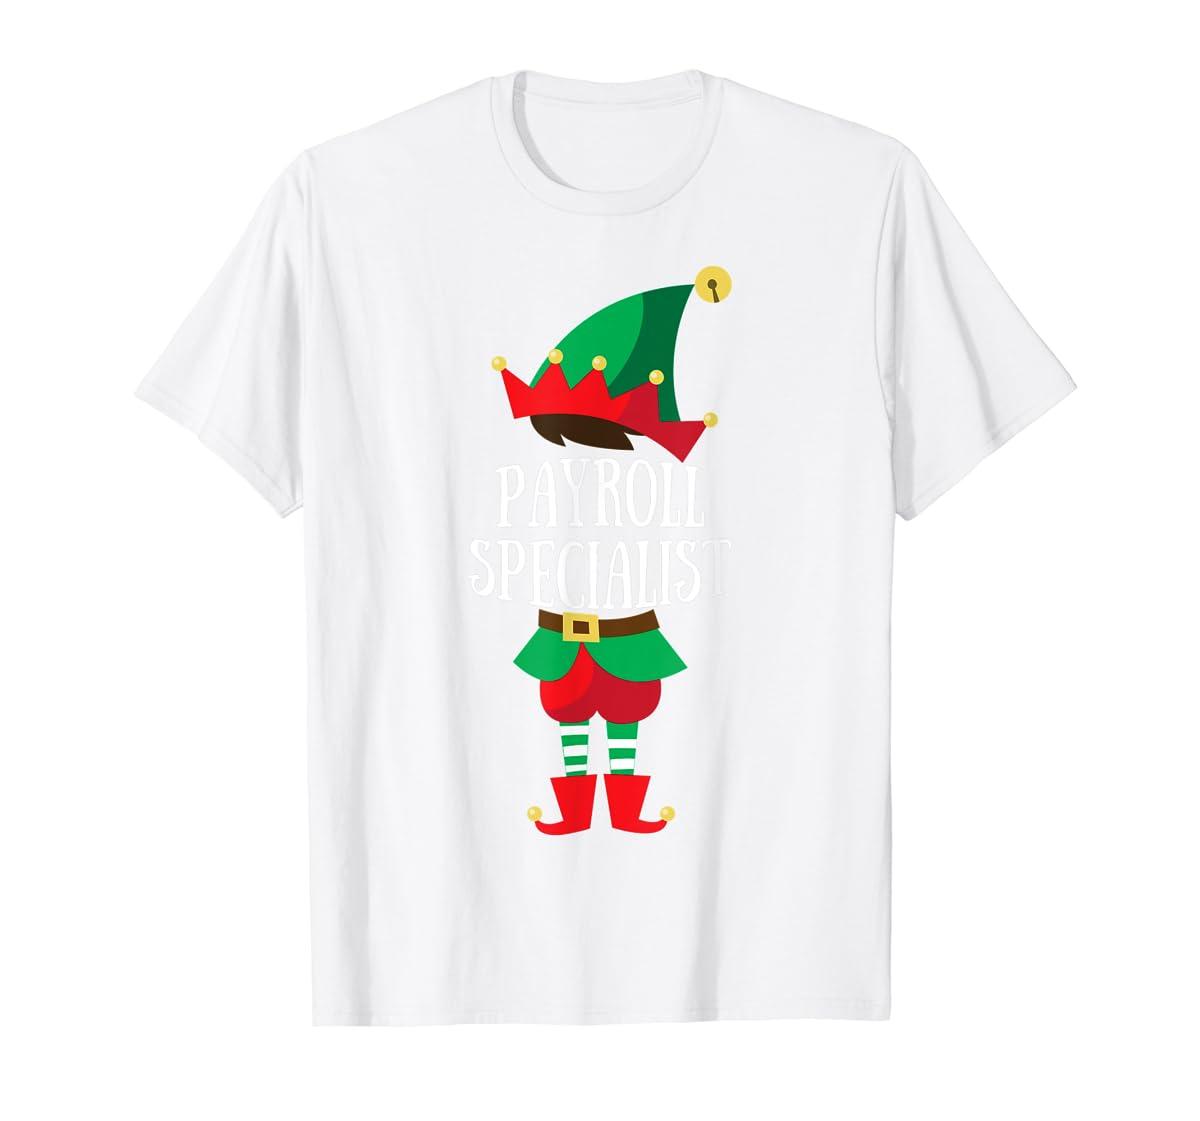 Elf Payroll Specialist Christmas Group Matching T-Shirt-Men's T-Shirt-White